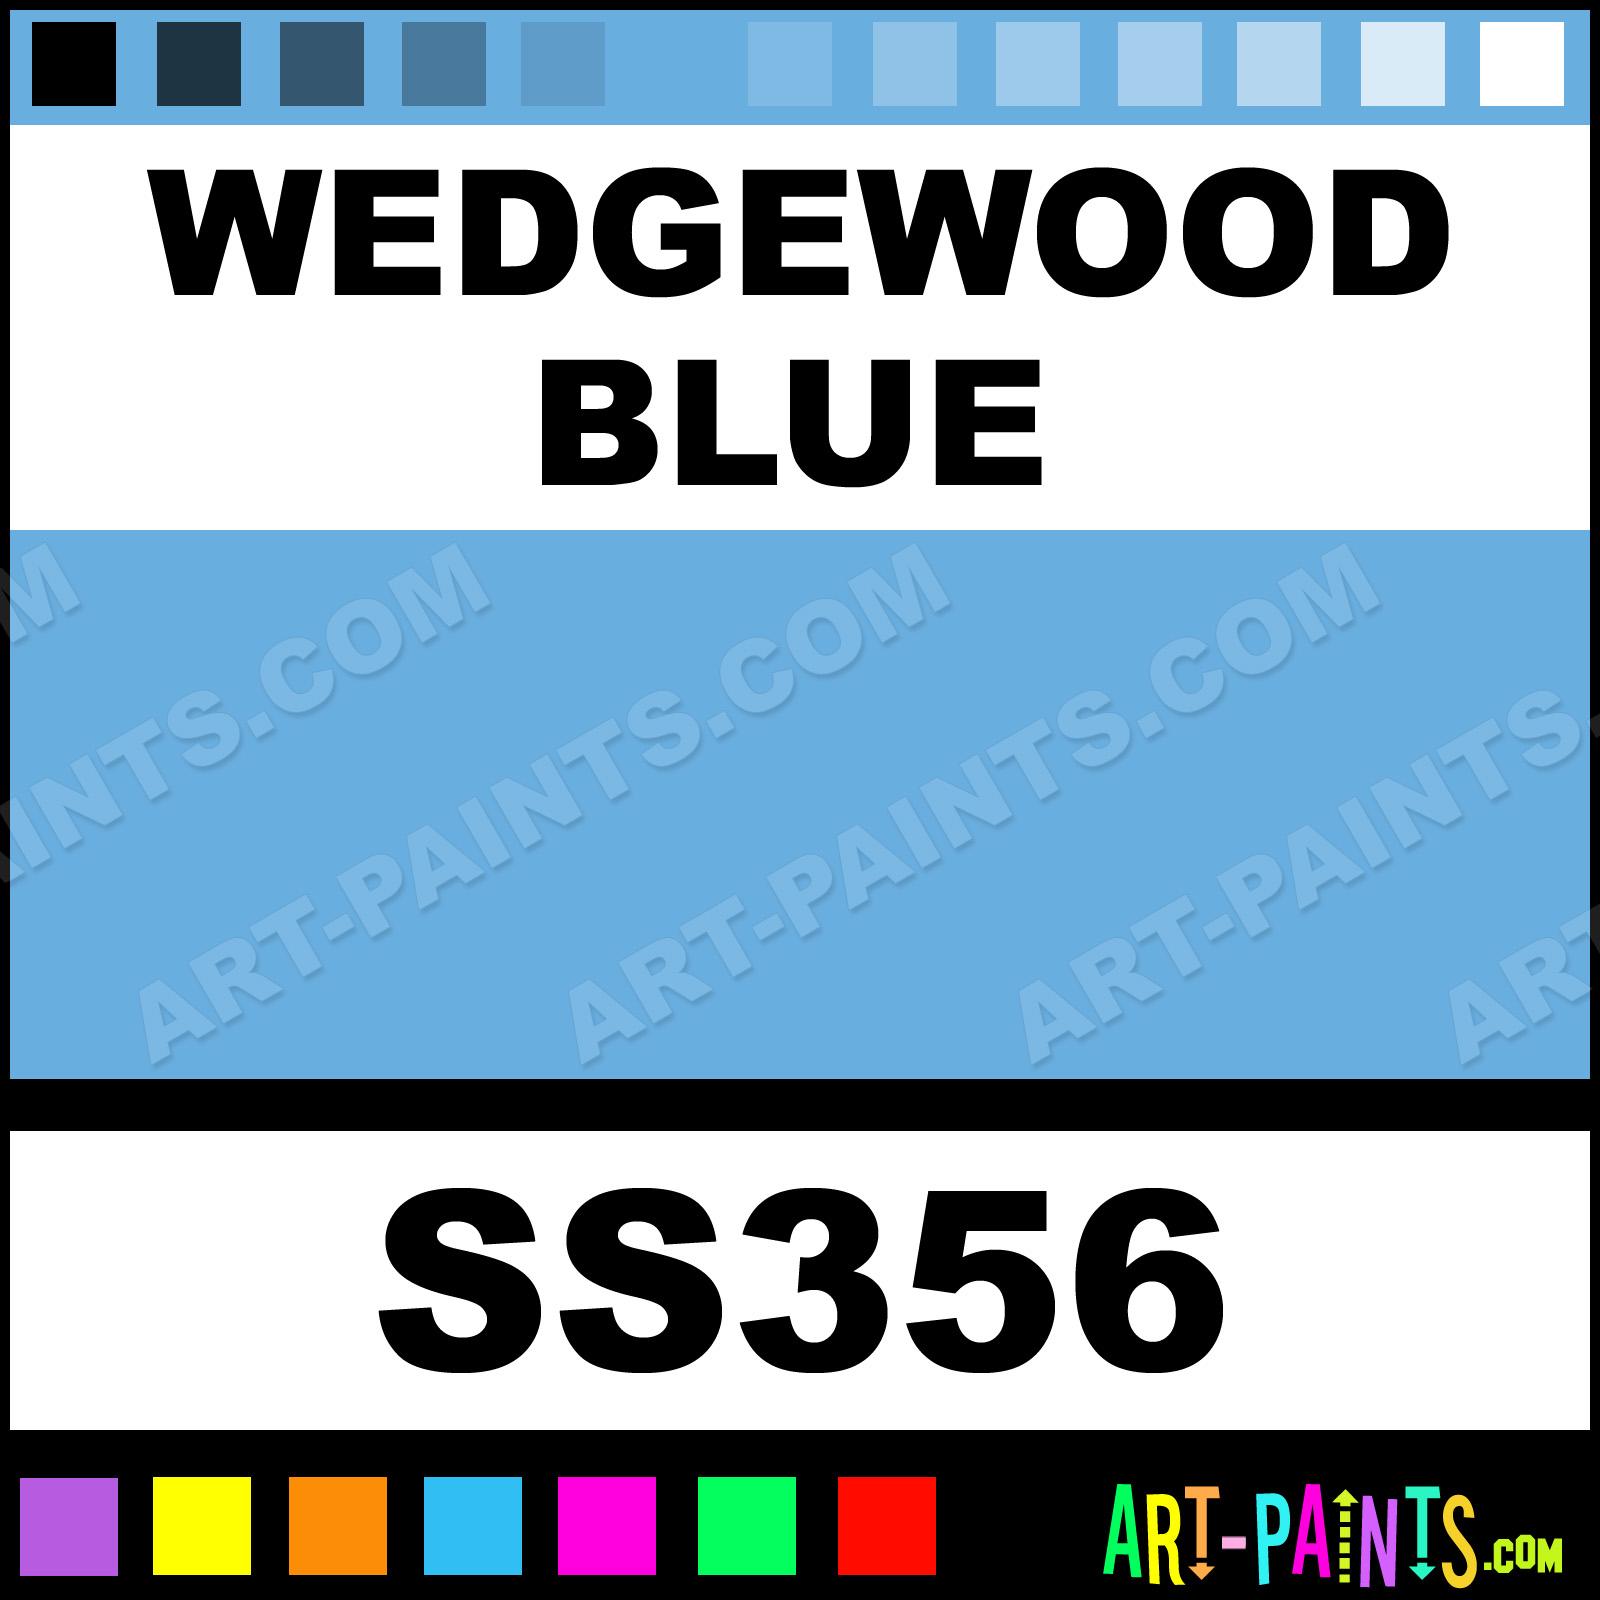 Wedgewood Blue Paint